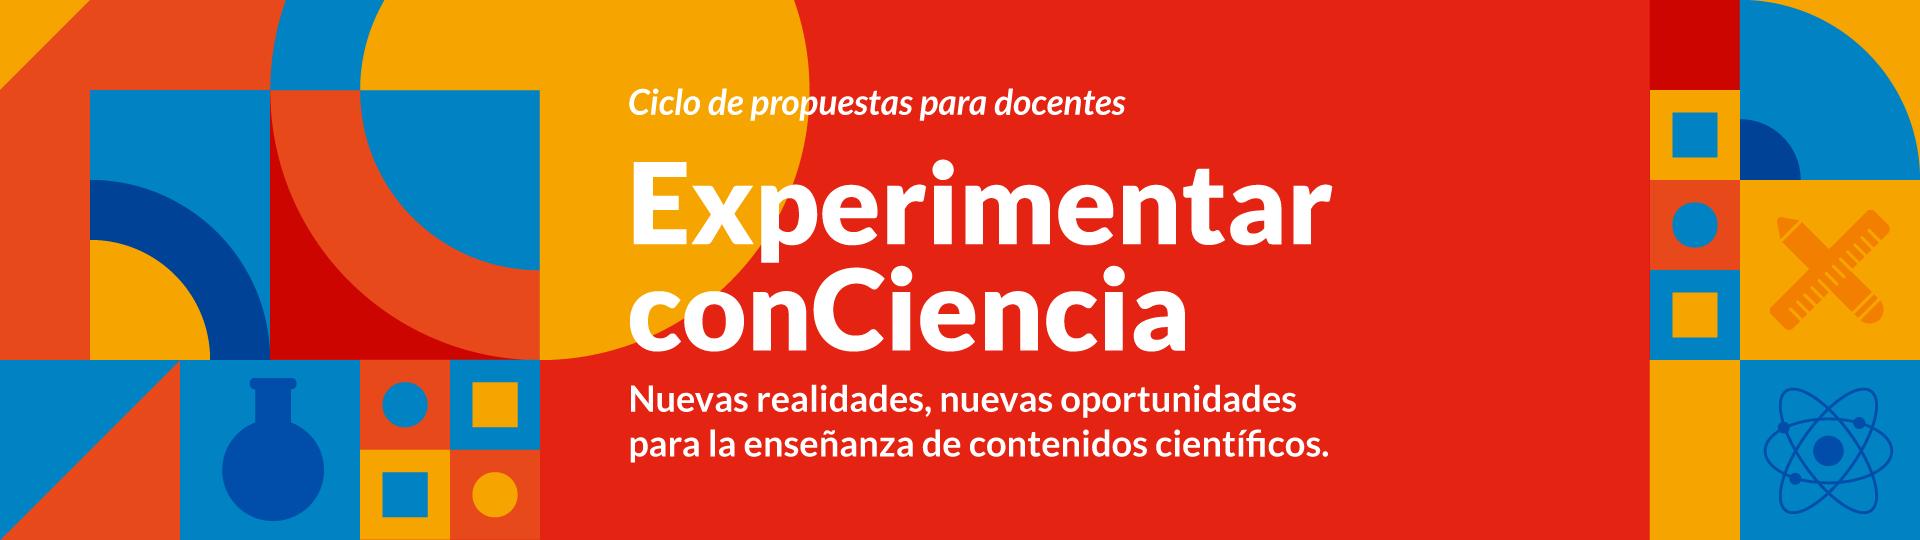 Experimentar-conCiencia_web-slideHOME